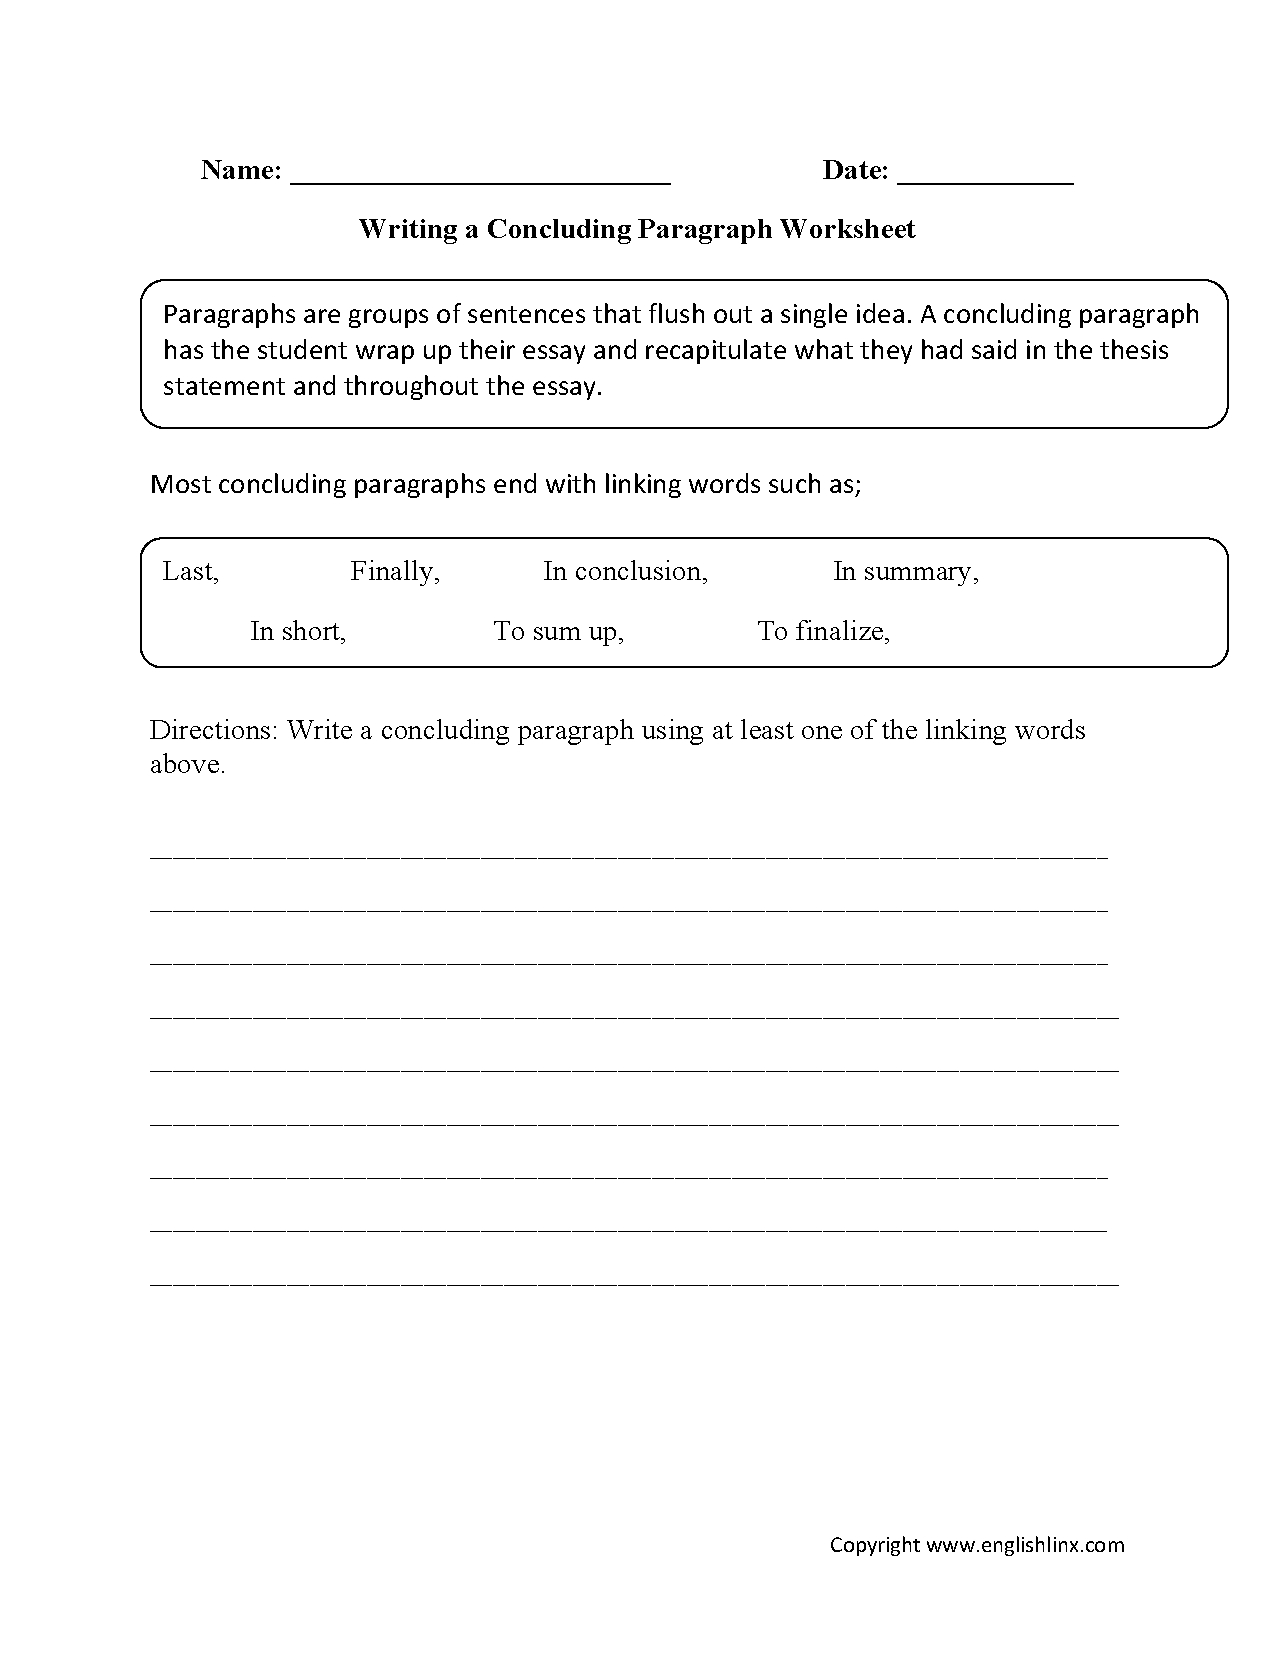 Writing Worksheets   Paragraph Writing Worksheets   Free Printable Paragraph Writing Worksheets